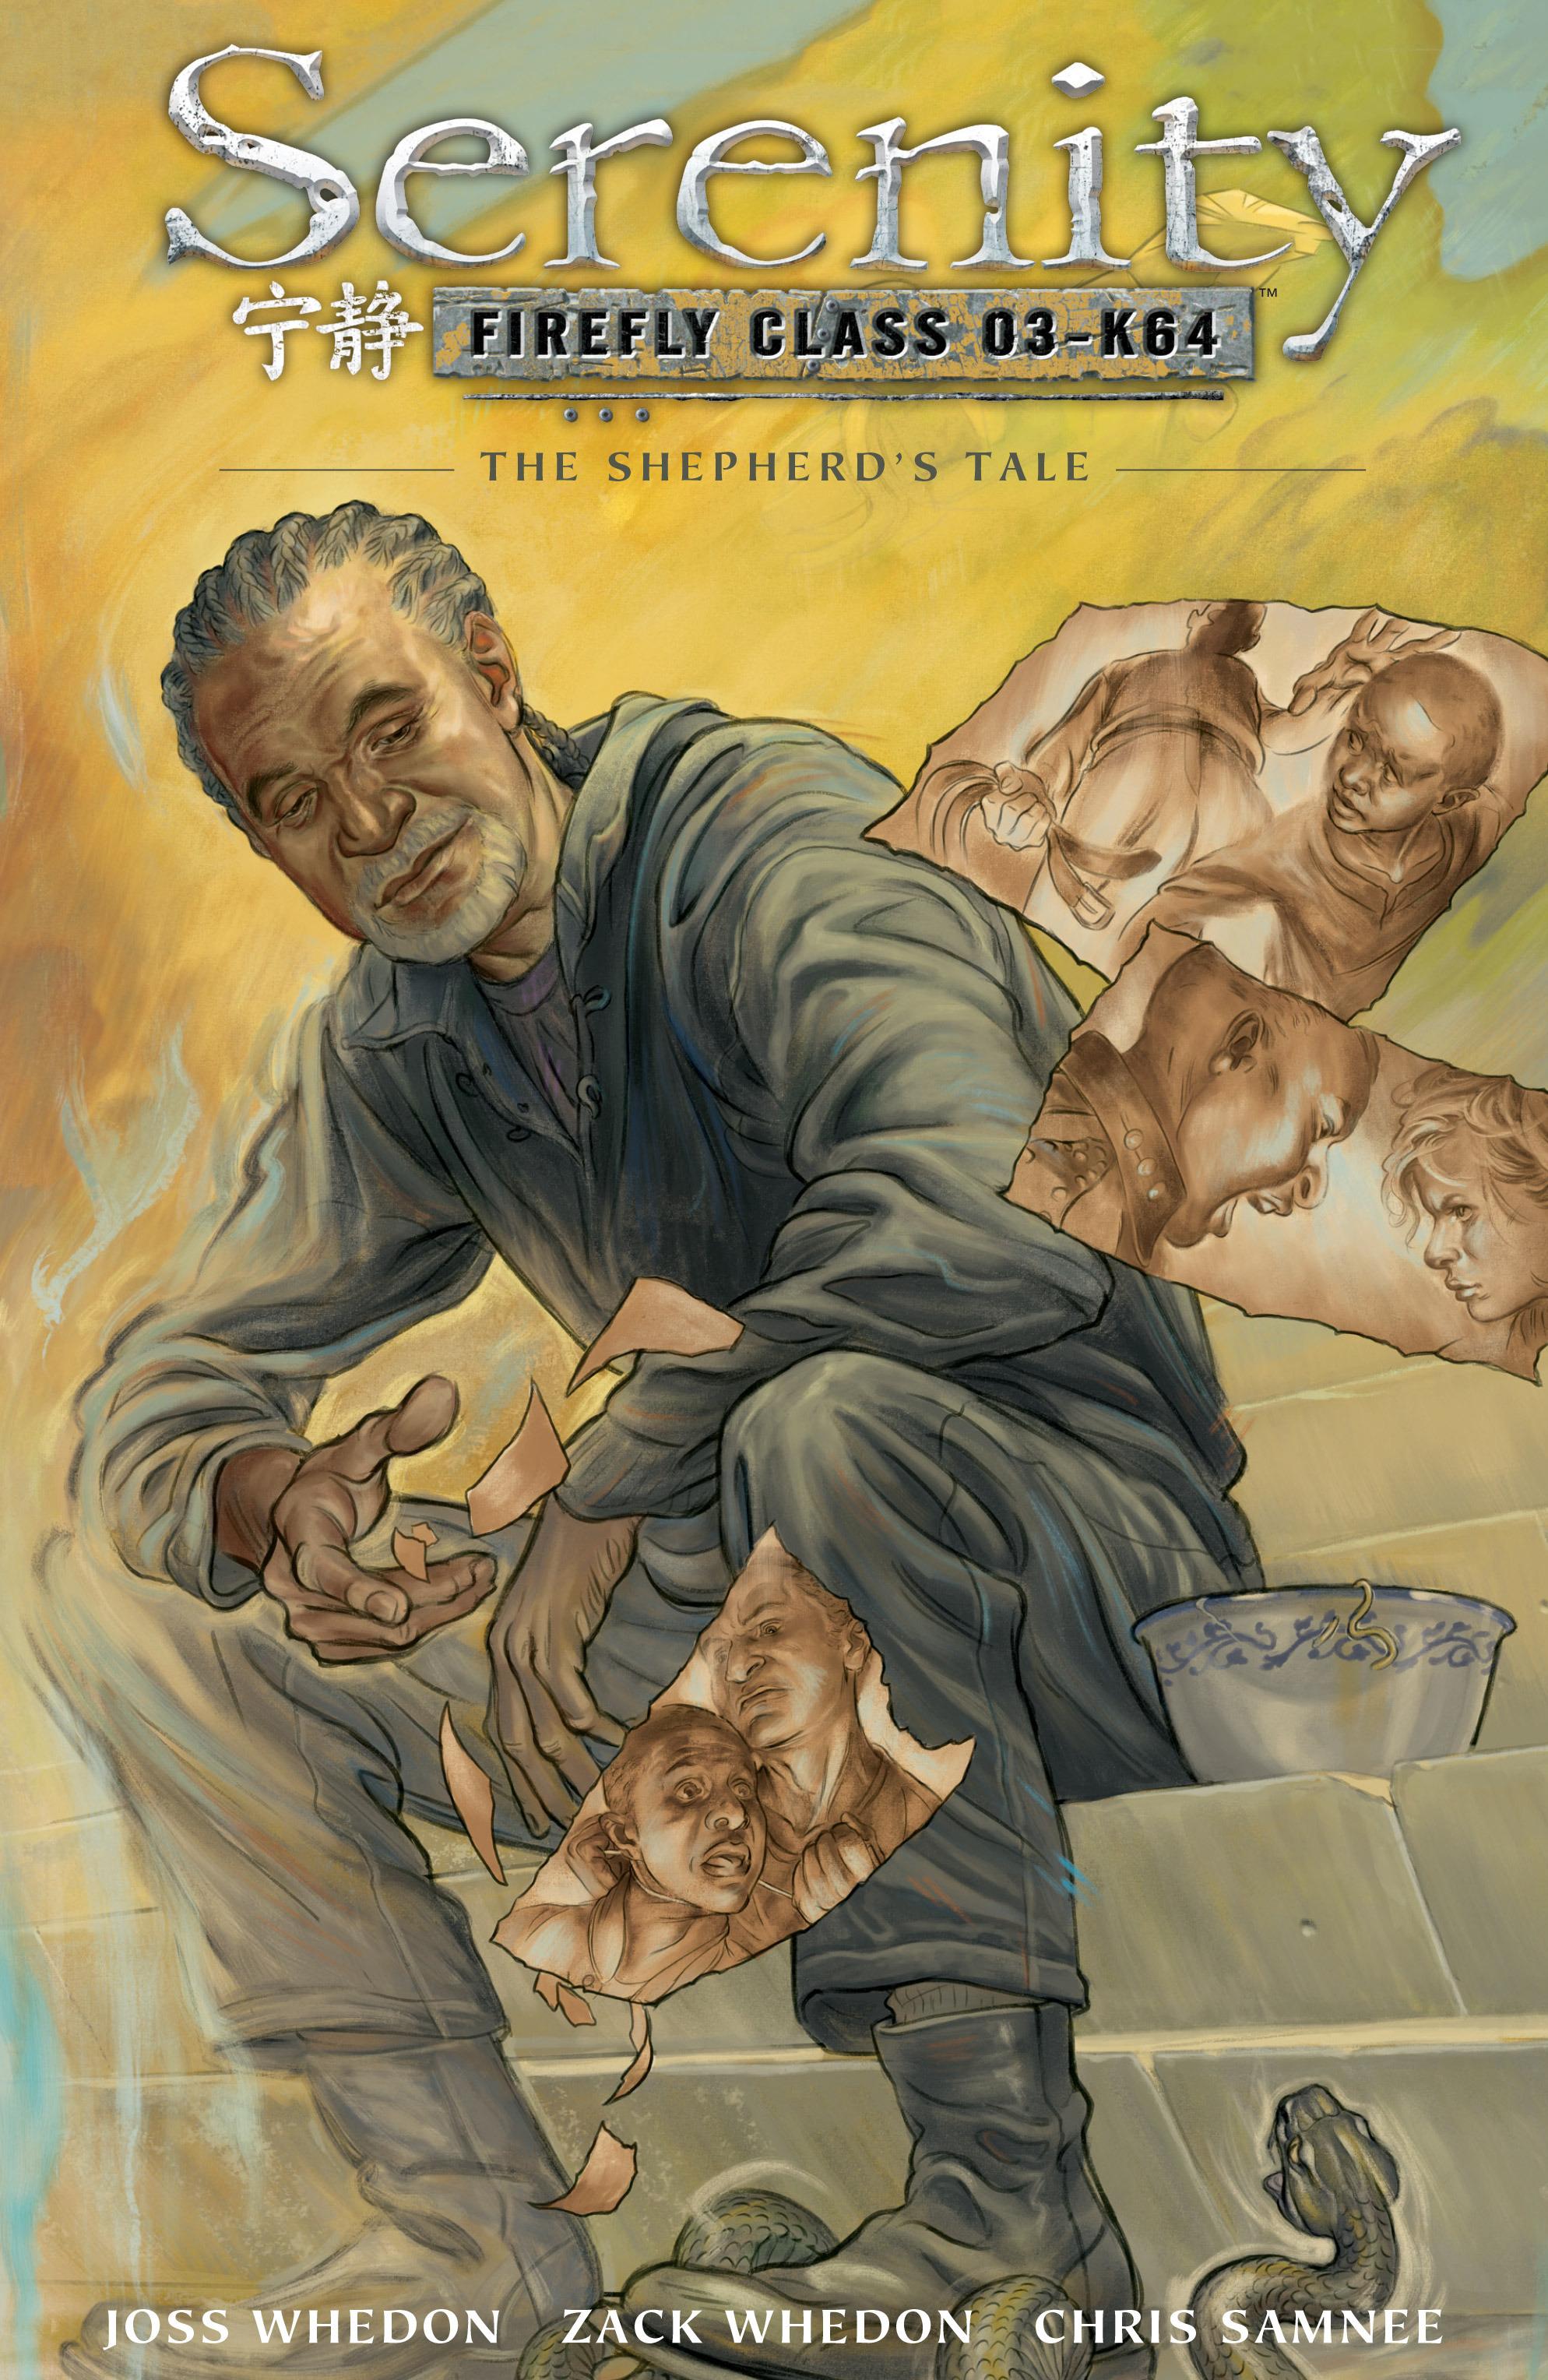 Read online Serenity Volume Three: The Shepherd's Tale comic -  Issue # TPB - 1